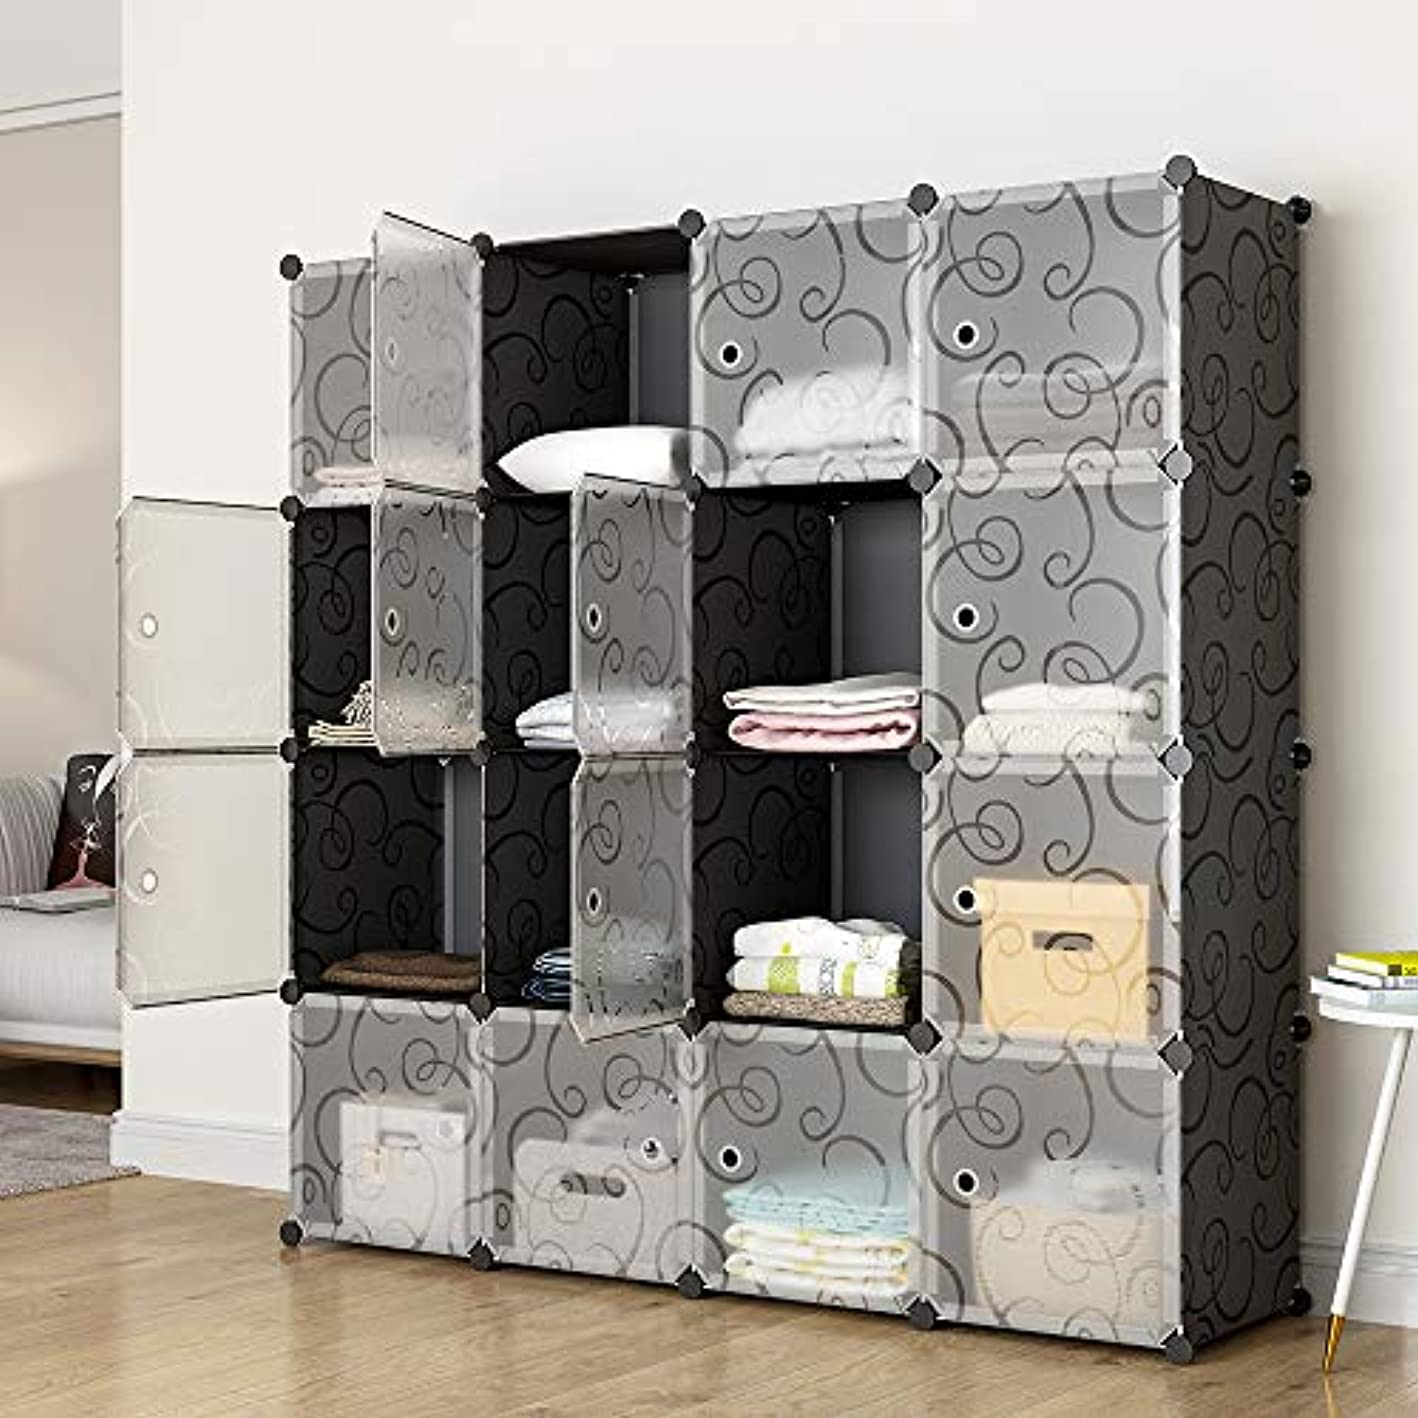 KOUSI Portable Storage Cube Cube Organizer Cube Storage Shelves Cube Shelf Room Organizer Clothes Storage Cubby Shelving Bookshelf Toy Organizer Cabinet, Black, 16 Cubes